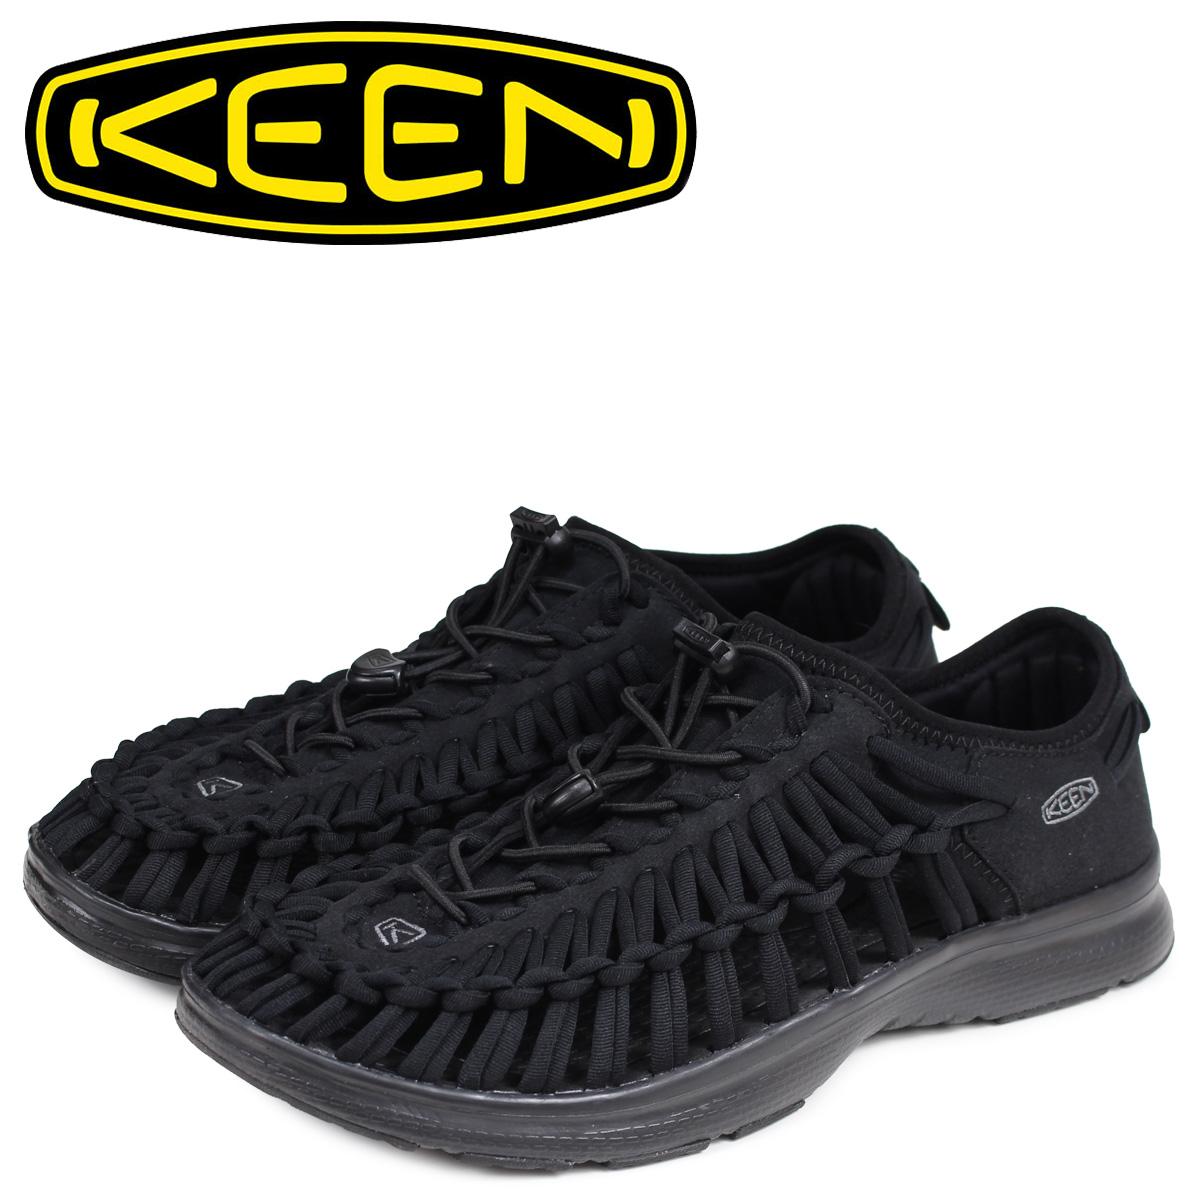 KEEN キーン ユニーク サンダル スポーツサンダル メンズ UNEEK O2 ブラック 黒 1018709